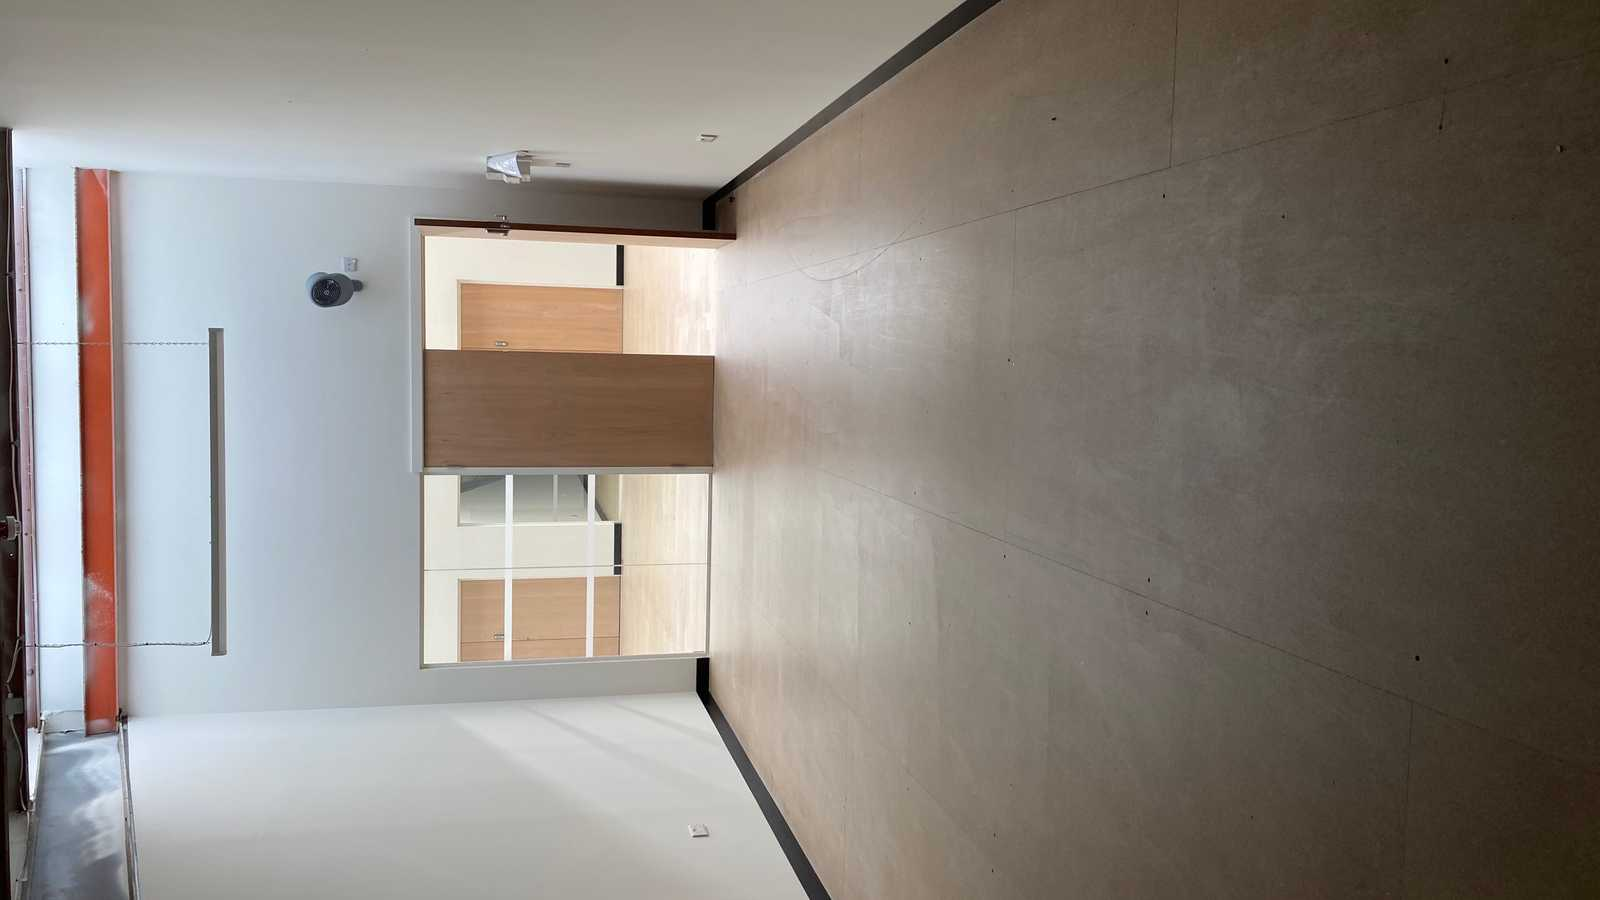 Creative Space - Studio 208 - Oxgate House - Brent Cross